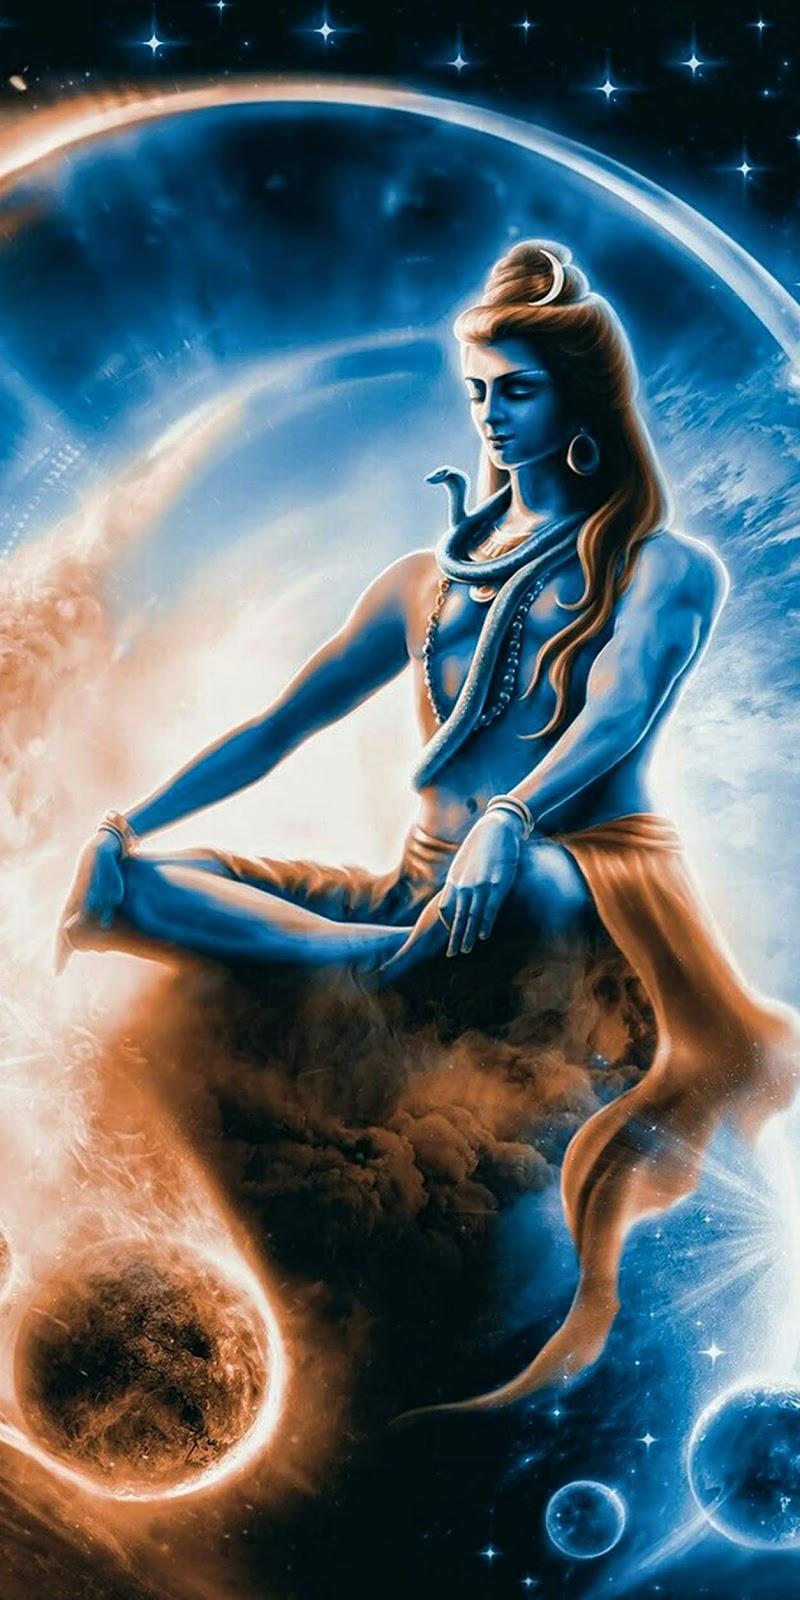 Lord Shiva in Tapas